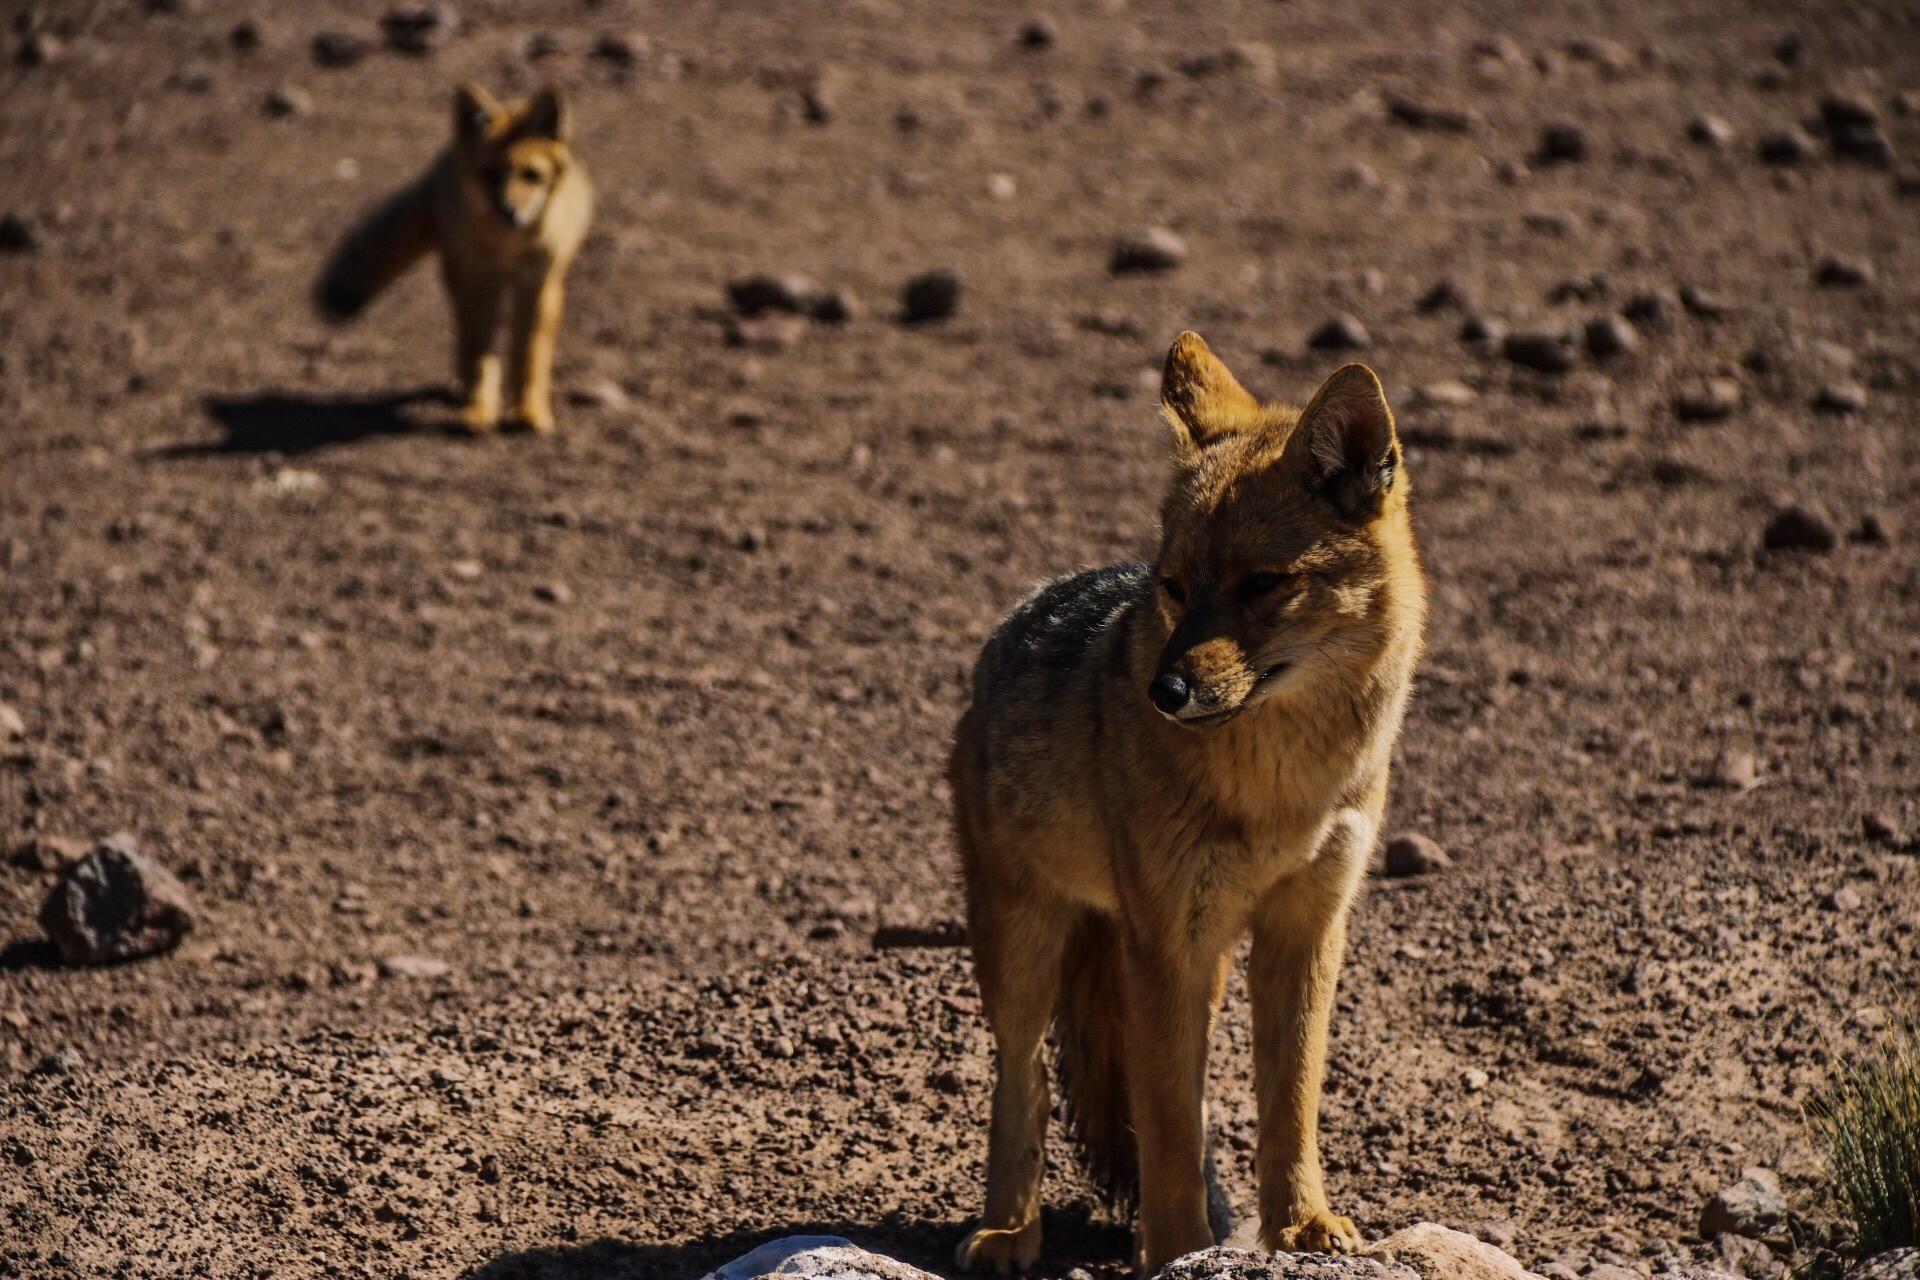 Wildlife near the Tatio Geysers.